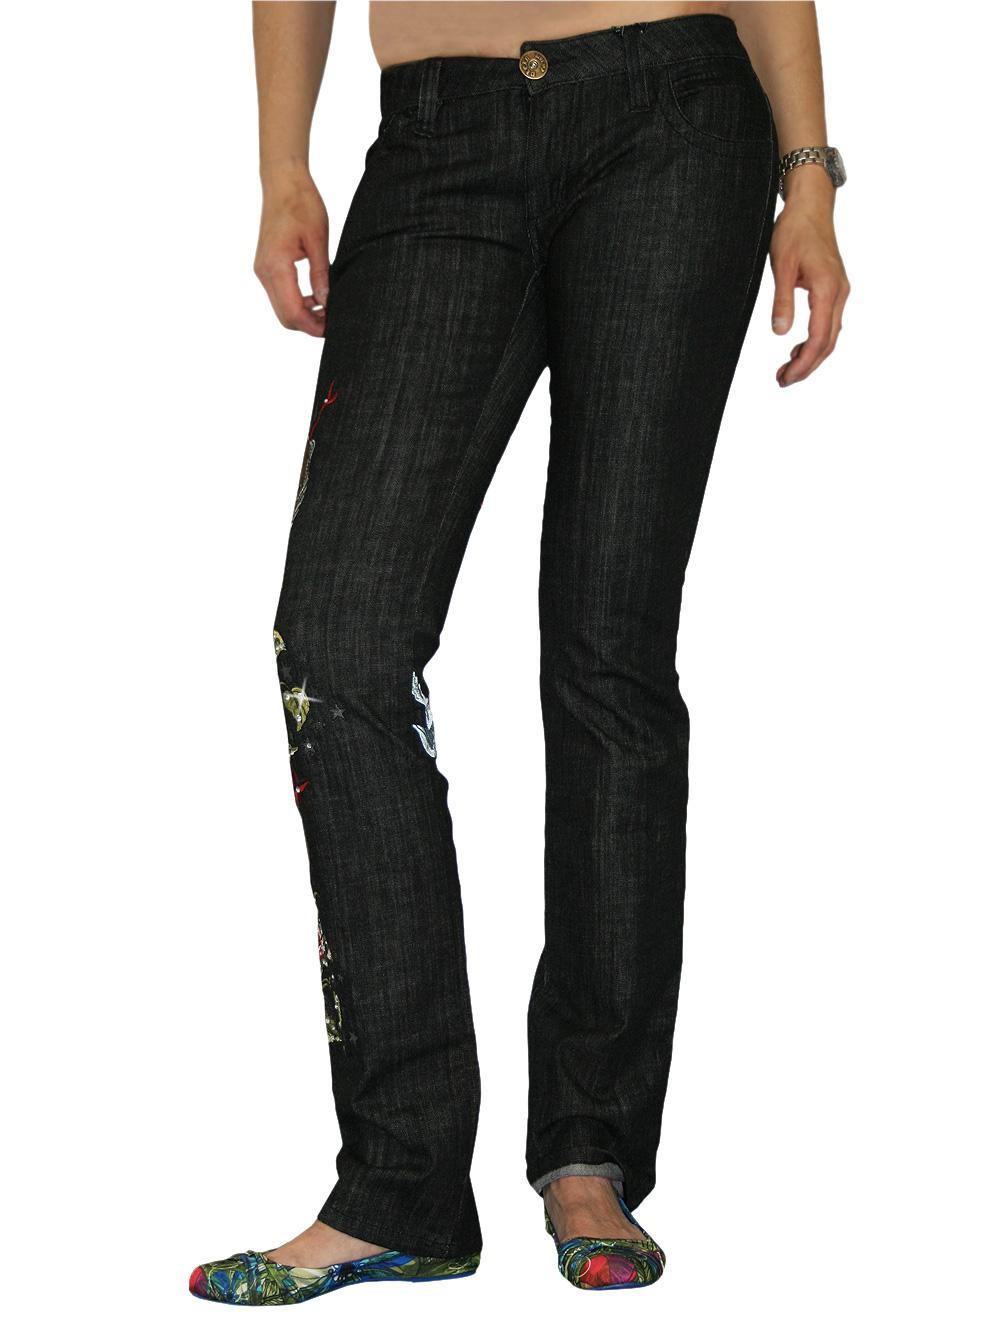 edle philipp plein damen strass jeans lovely birds in. Black Bedroom Furniture Sets. Home Design Ideas